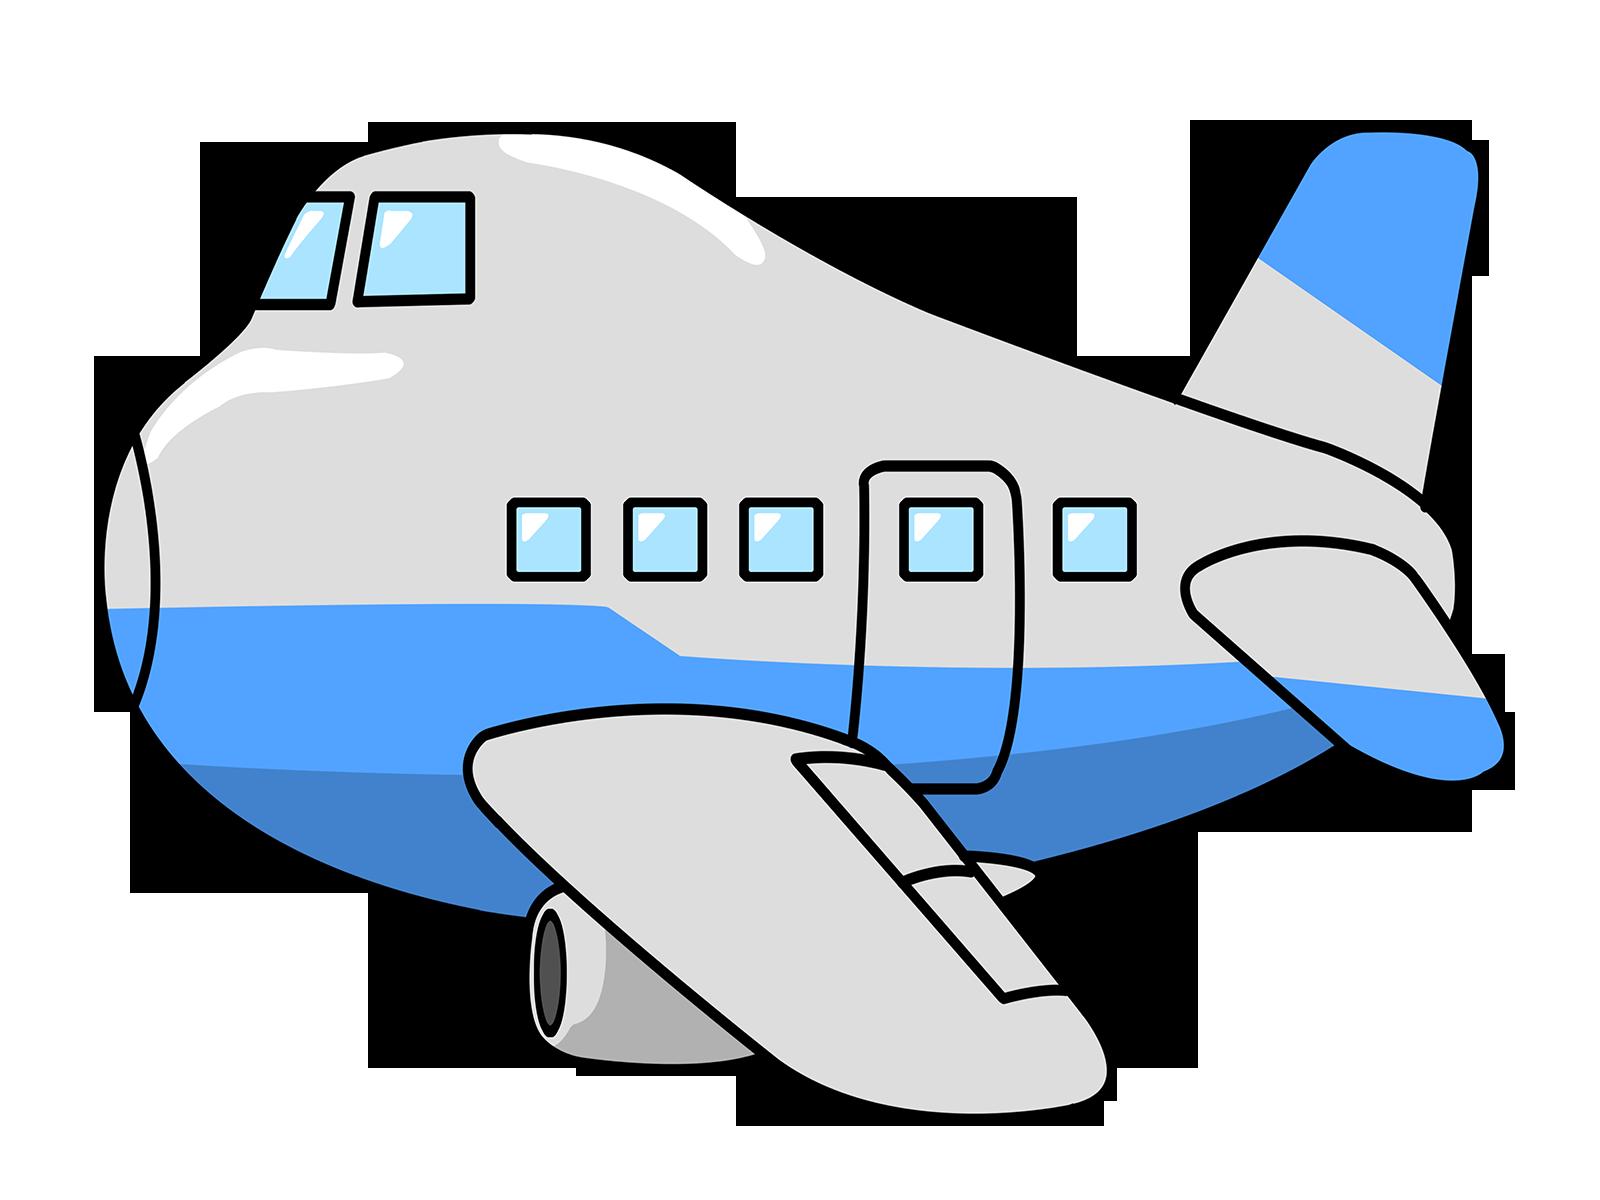 Airplane Cartoon Grey Drawing Free Image